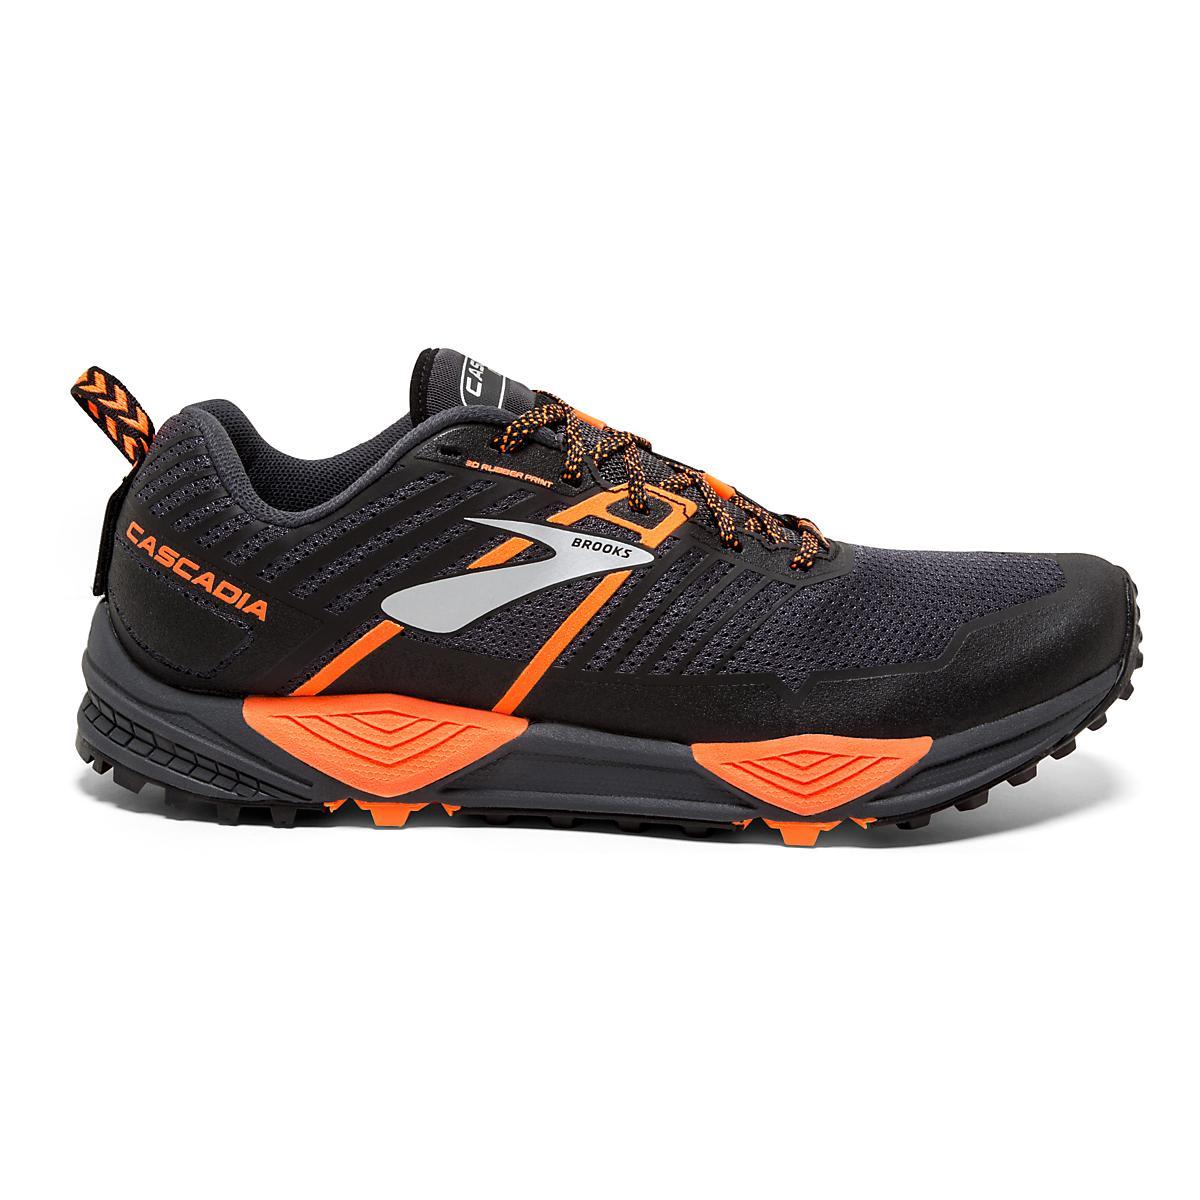 030fa2d2cf6 Mens Brooks Cascadia 13 Trail Running Shoe at Road Runner Sports